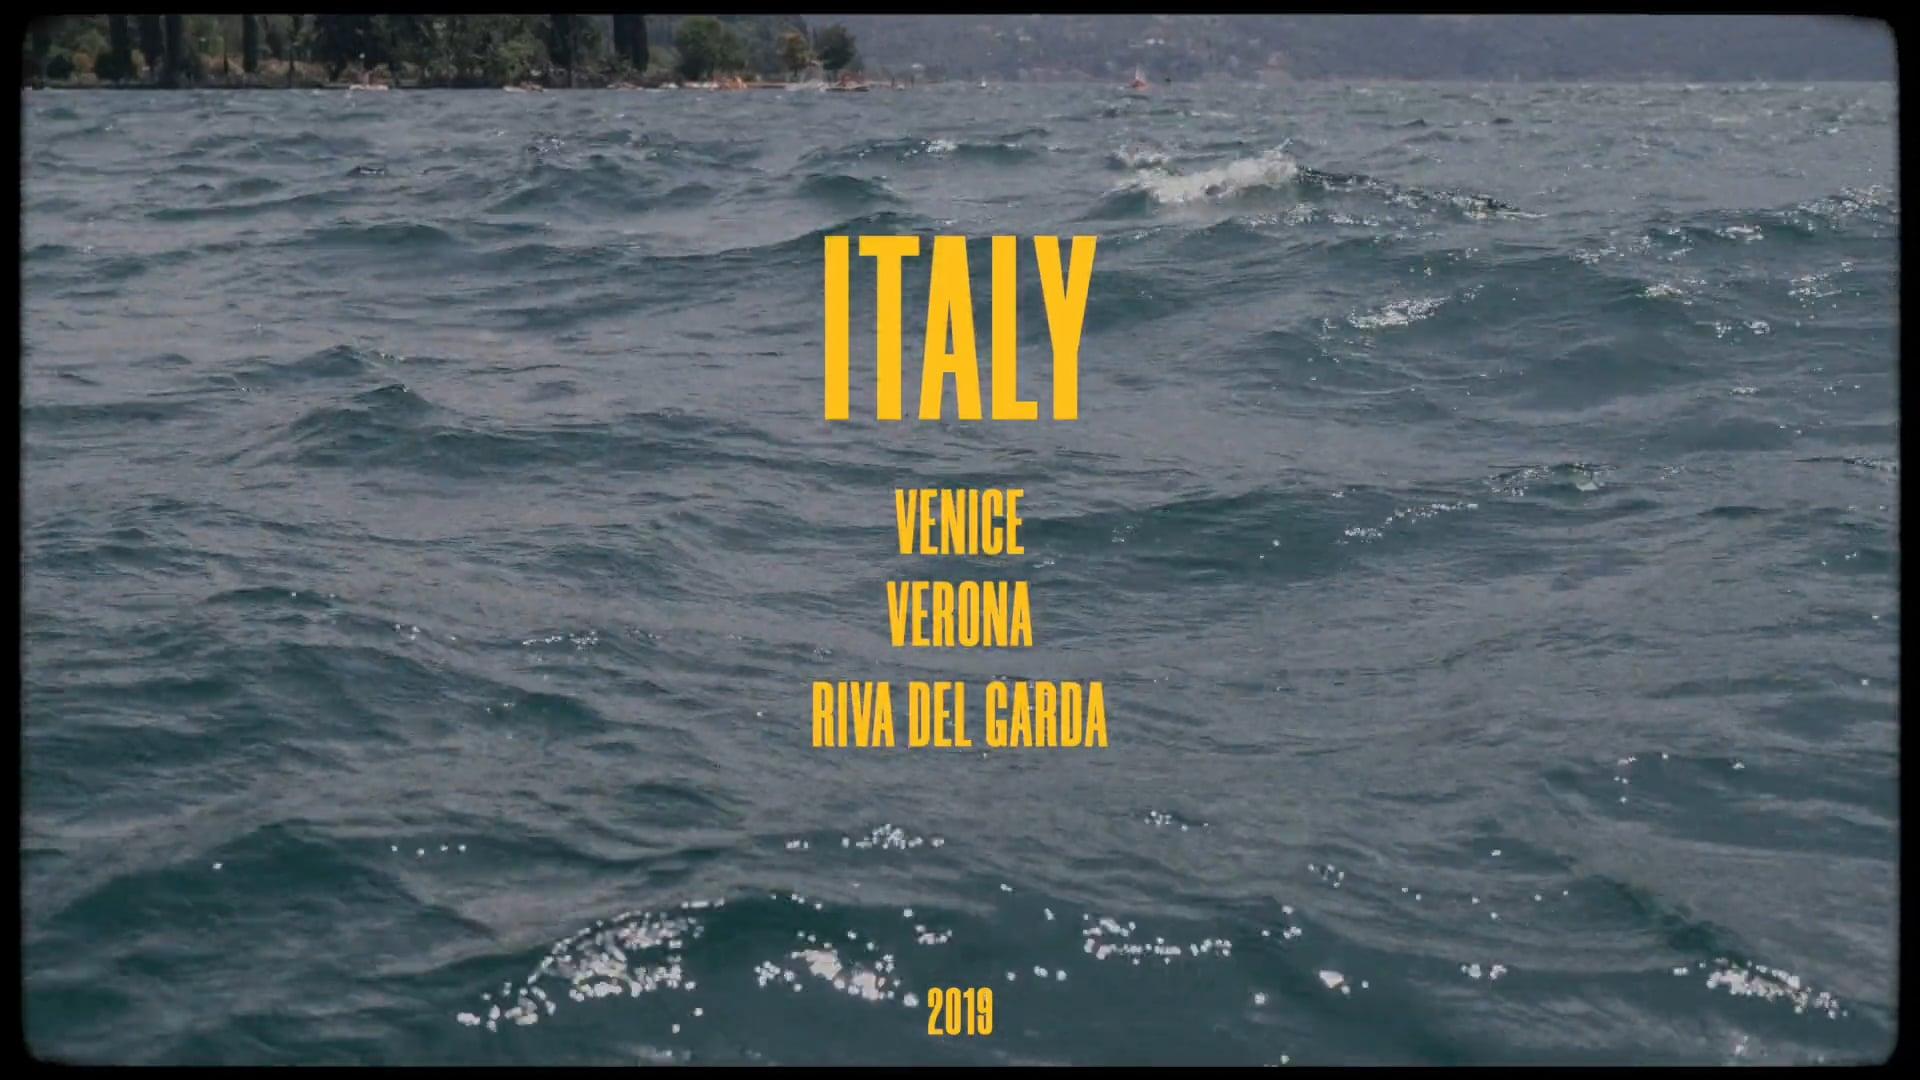 ITALY; VENICE/VERONA/RIVA DEL GARDA 2019